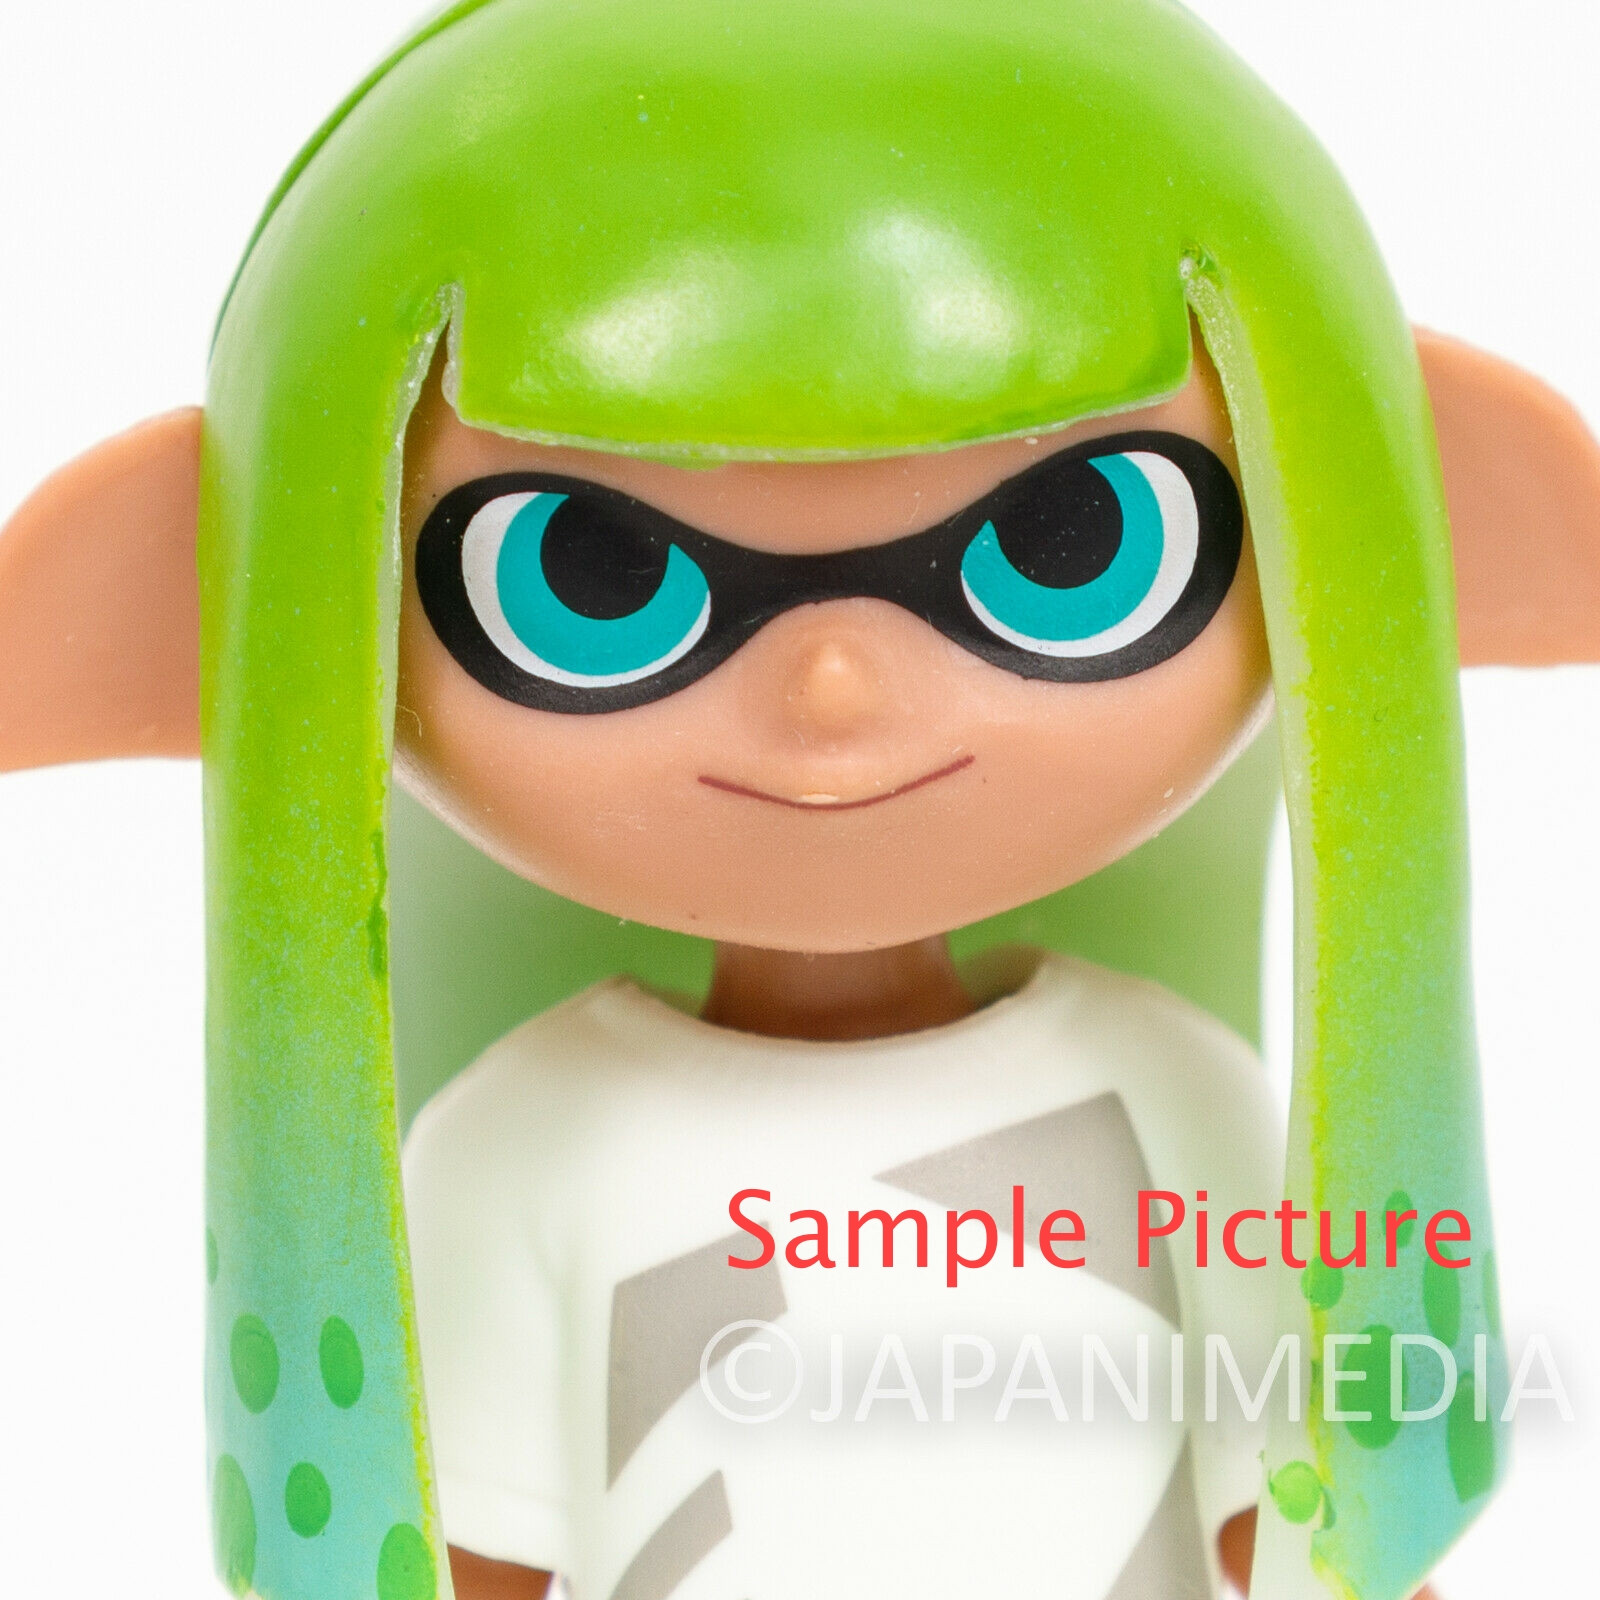 Splatoon 2 Dress-up Figure Gear Collection Squid GIRL 4 JAPAN Nintendo Switch 2